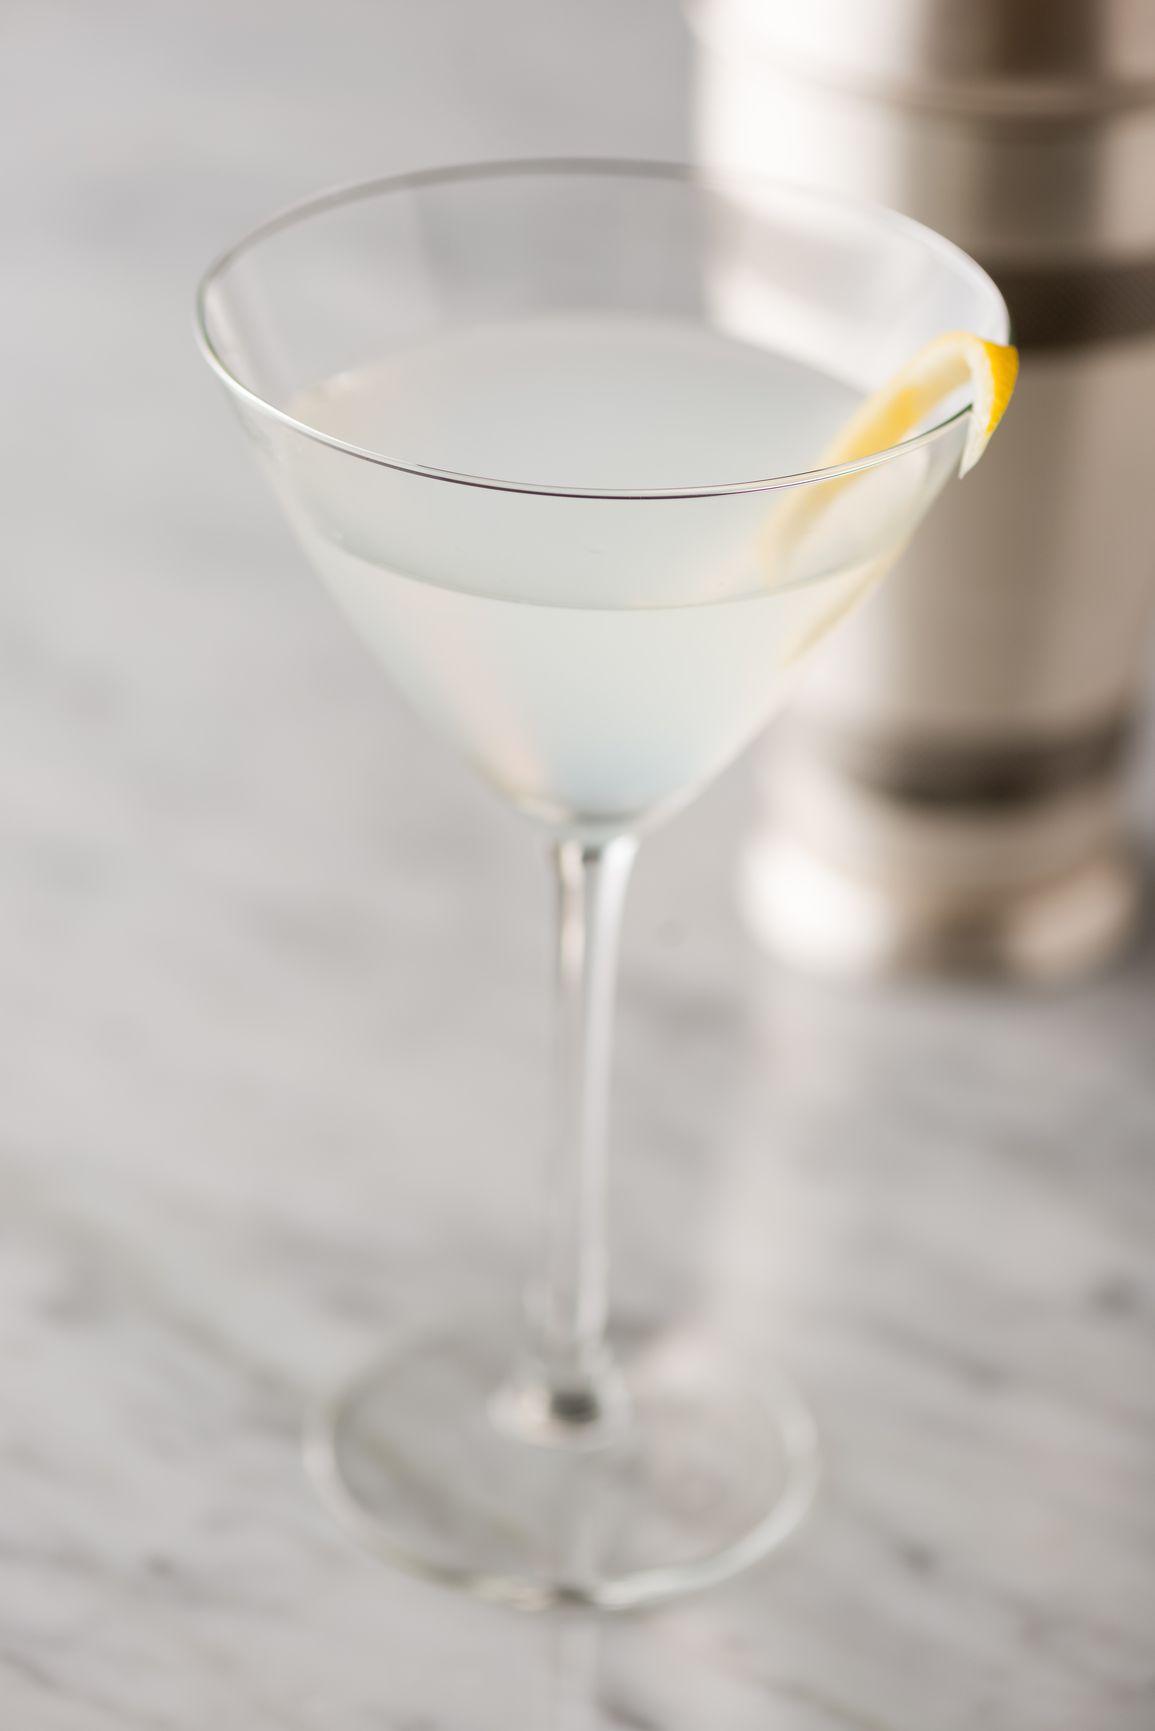 Show Off Your Best Vodka in the Clean Crisp Vodka Martini